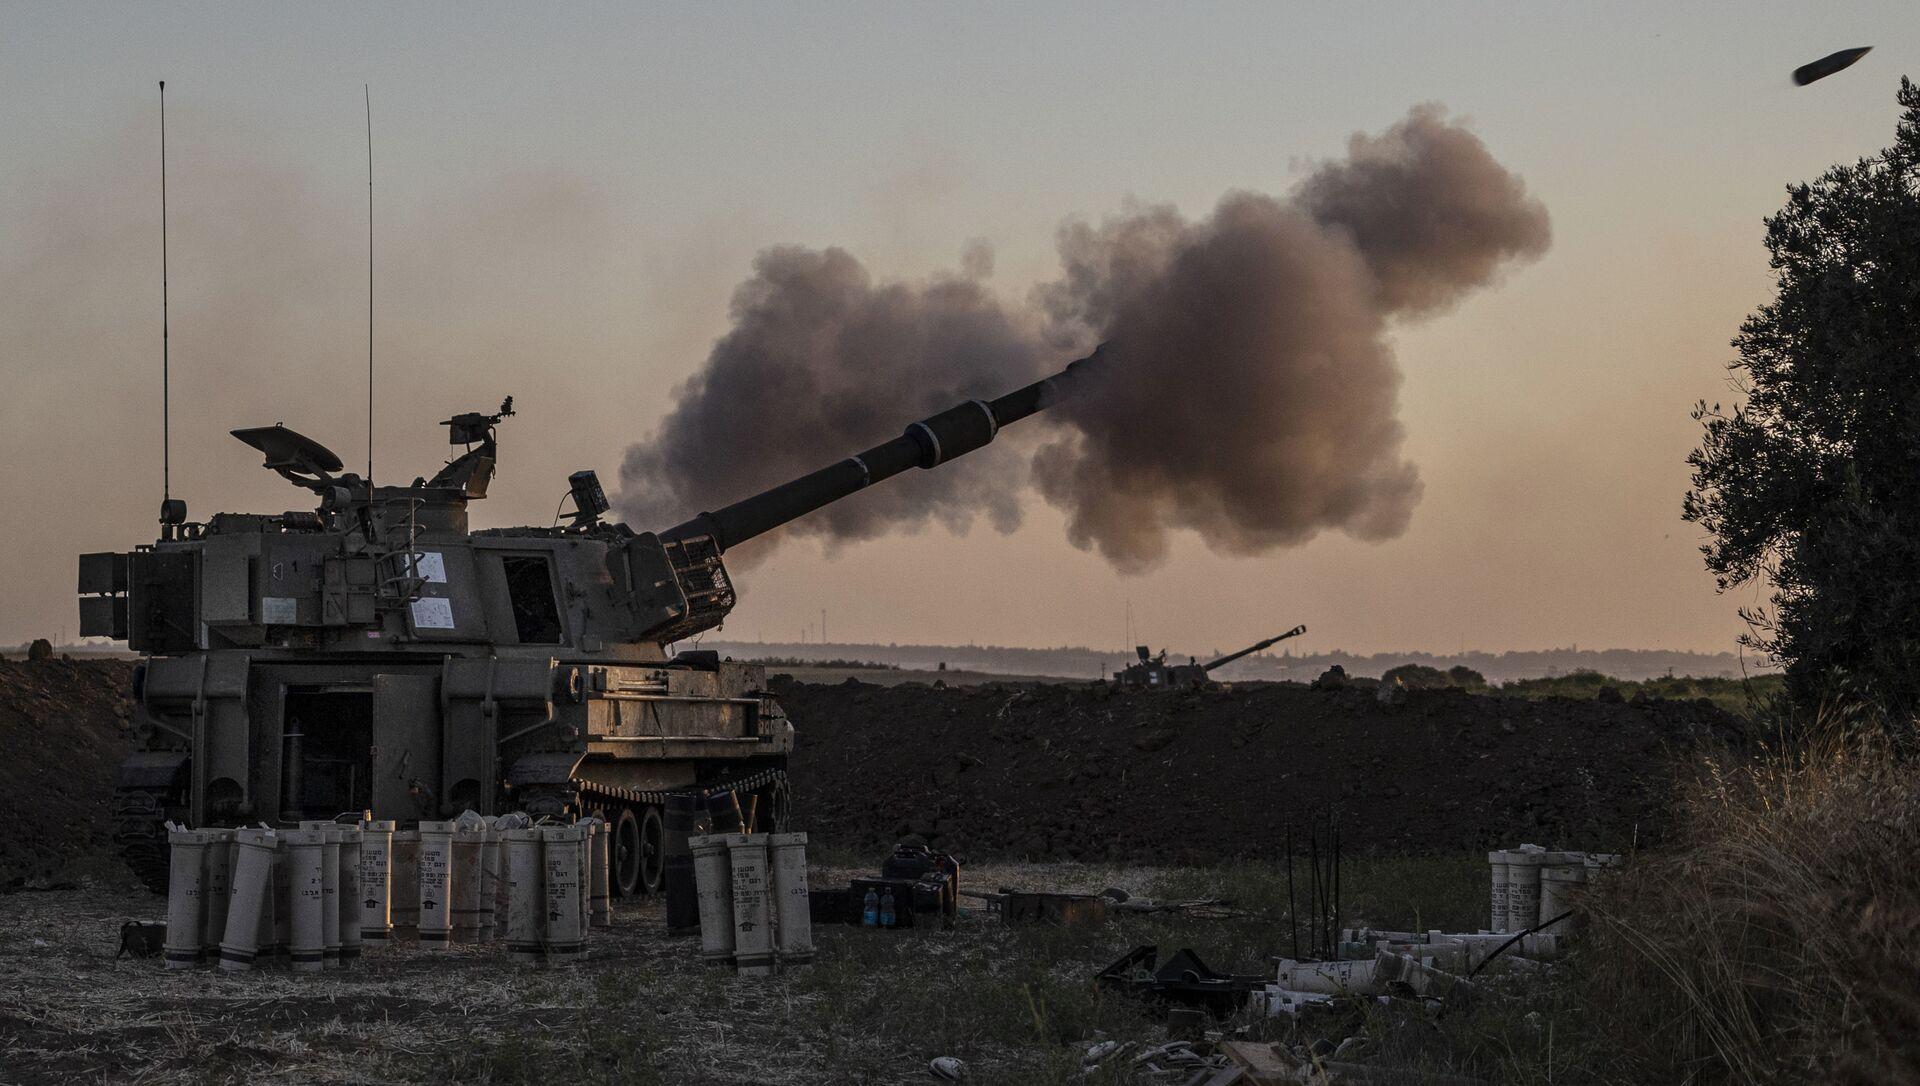 An Israeli artillery unit fires toward targets in Gaza Strip, at the Israeli Gaza border, Tuesday, May 18, 2021 - Sputnik International, 1920, 19.05.2021